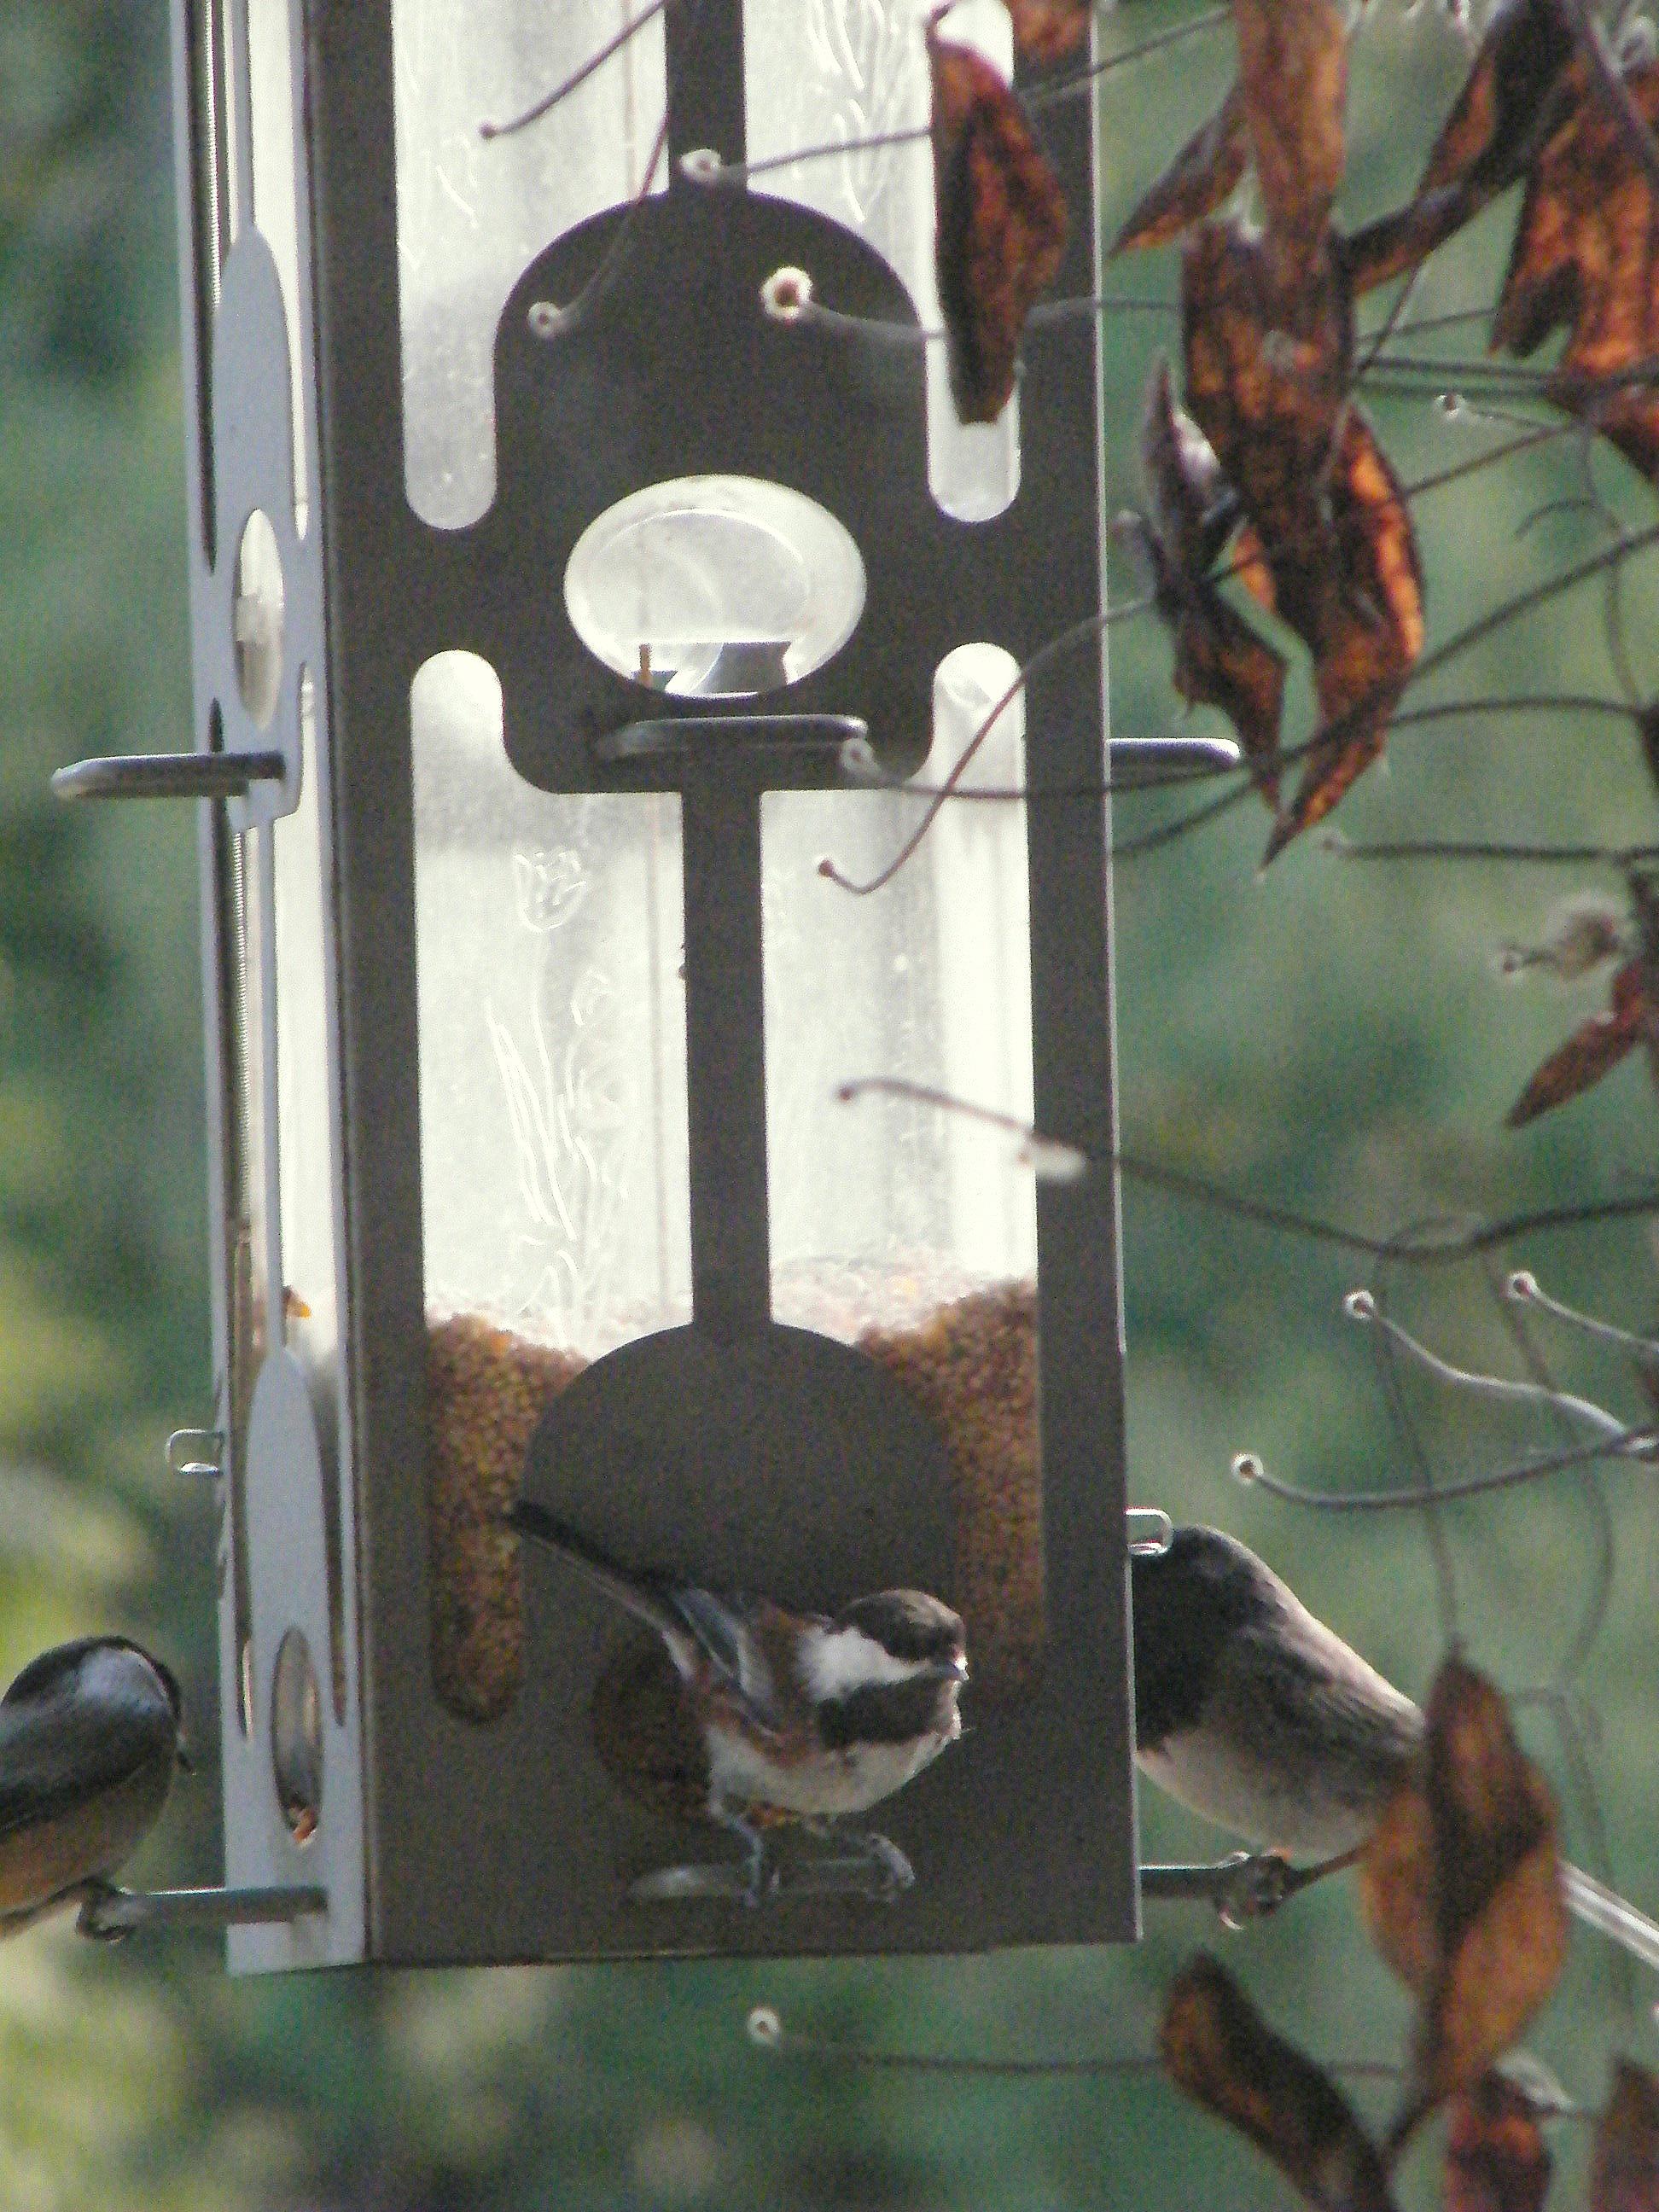 Stll more birds, feeding.